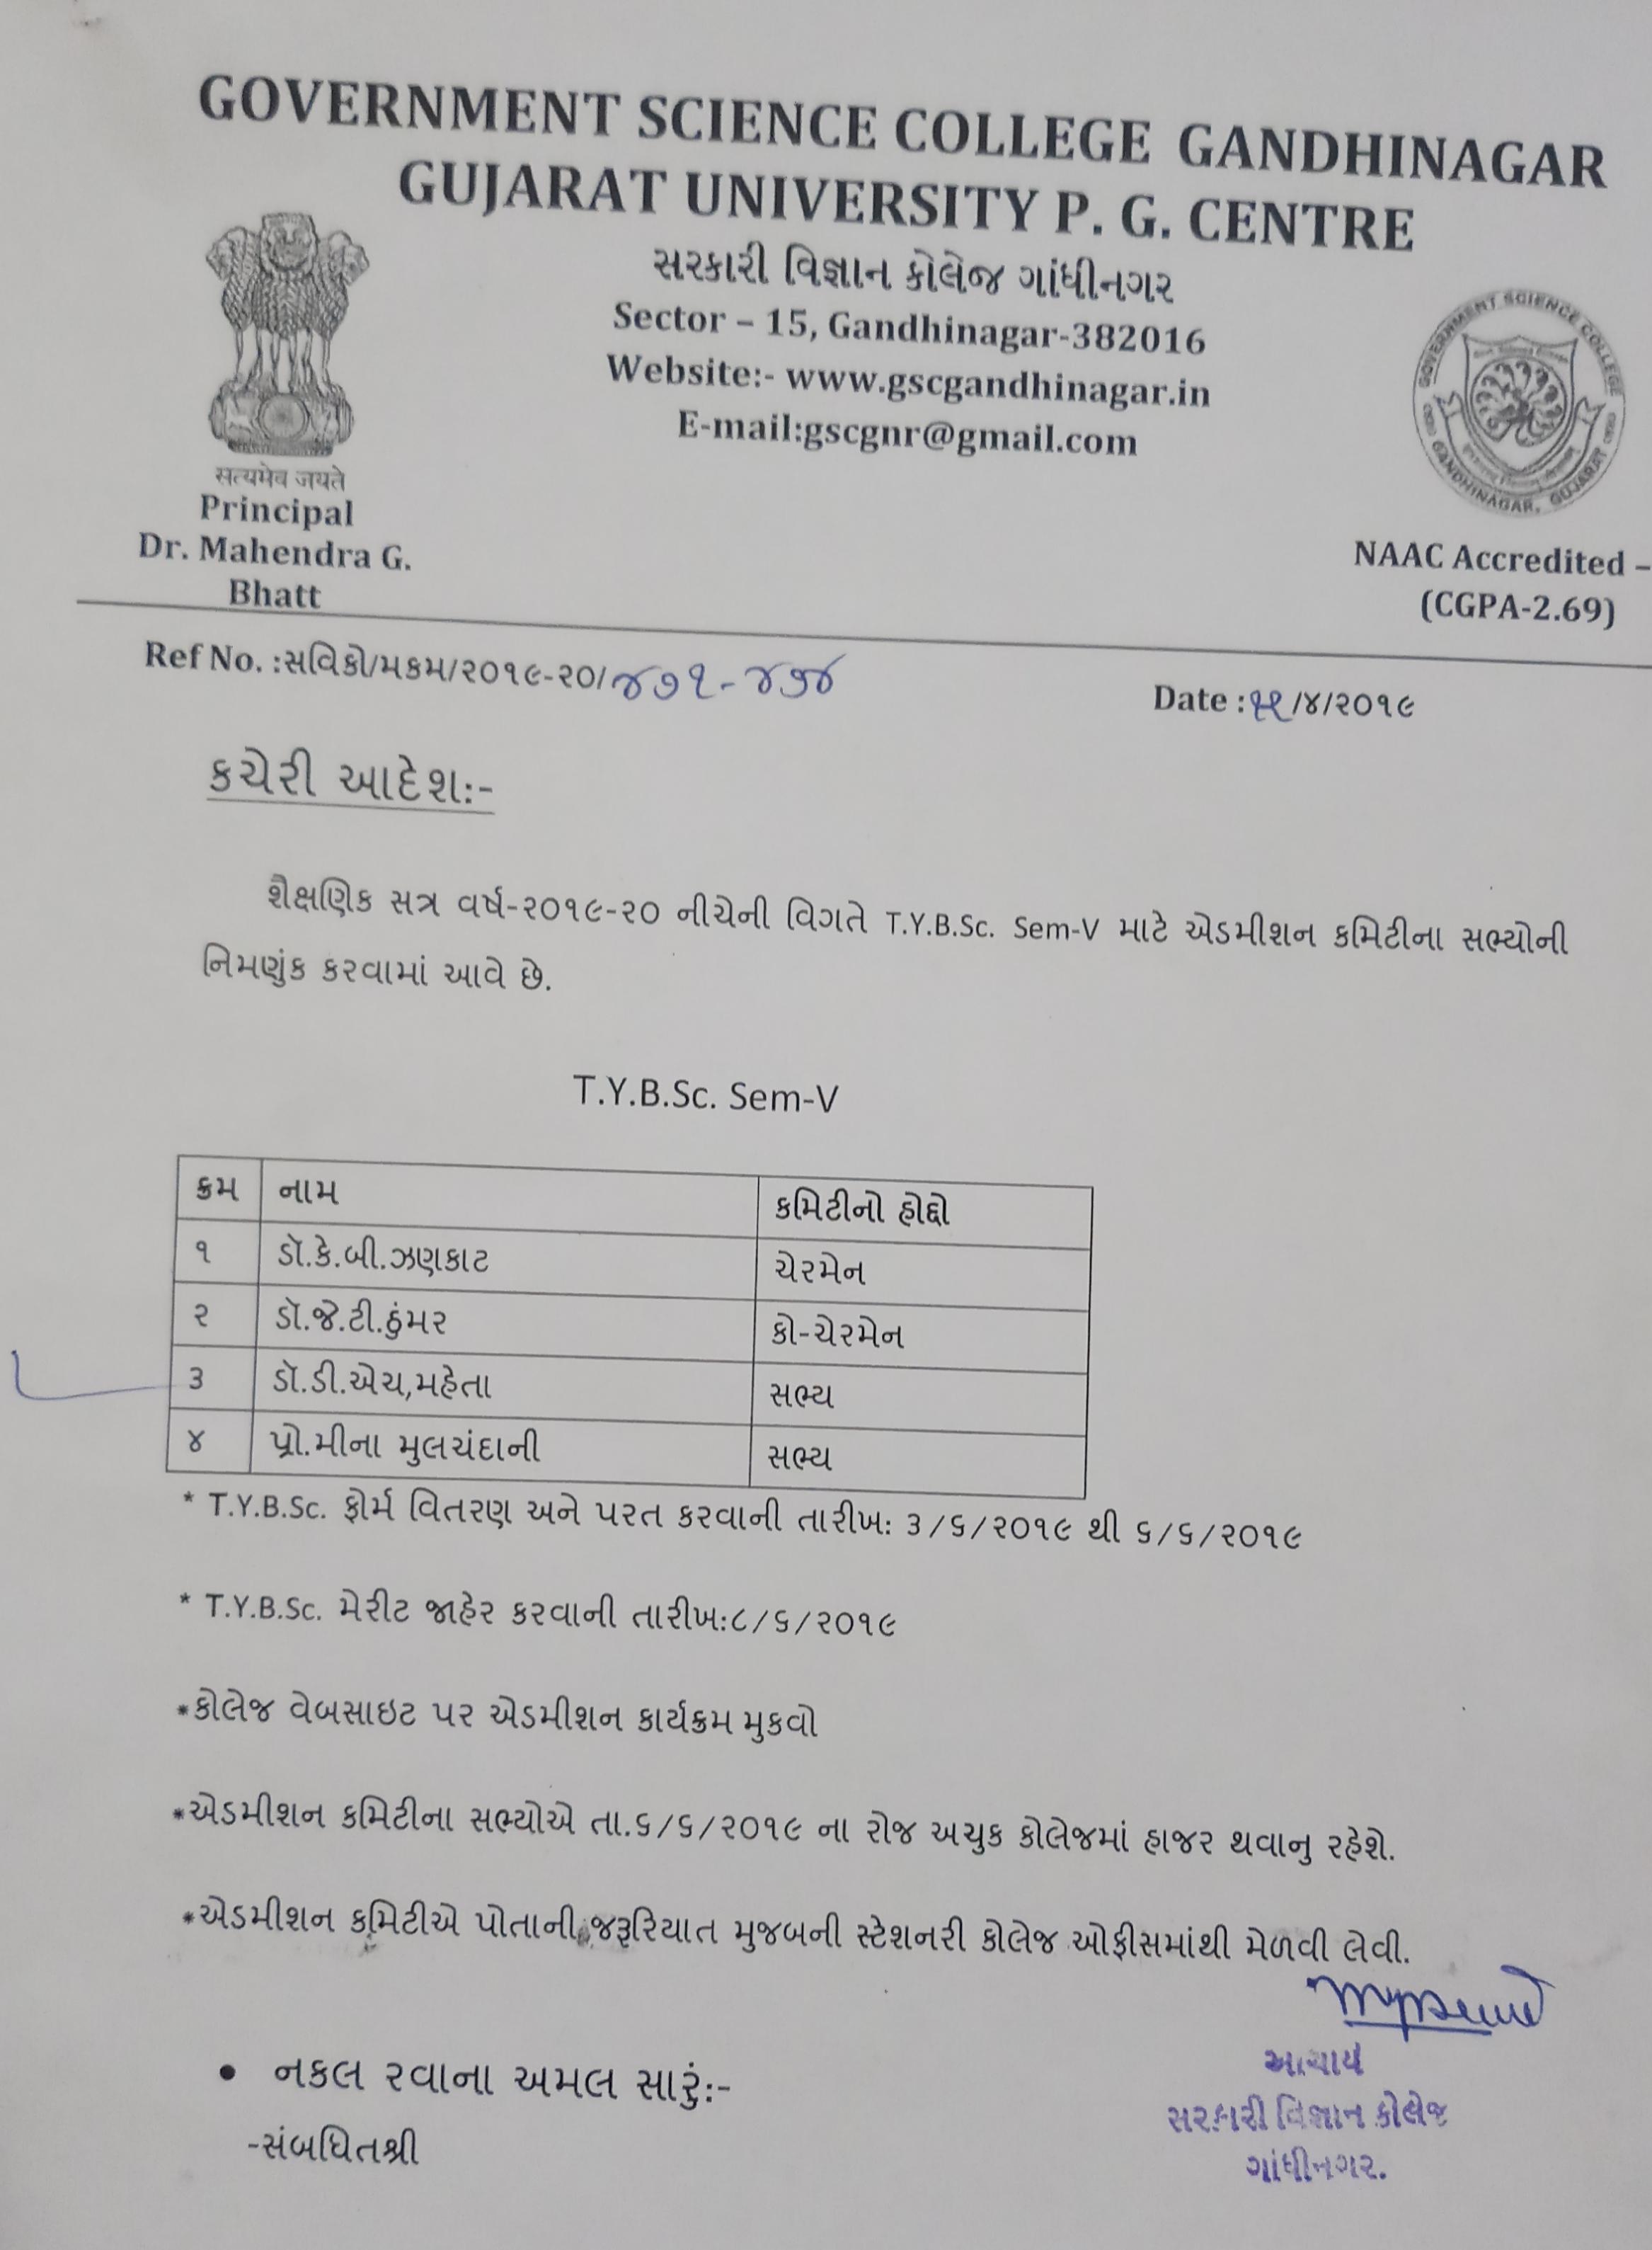 Government Science College, Gandhinagar